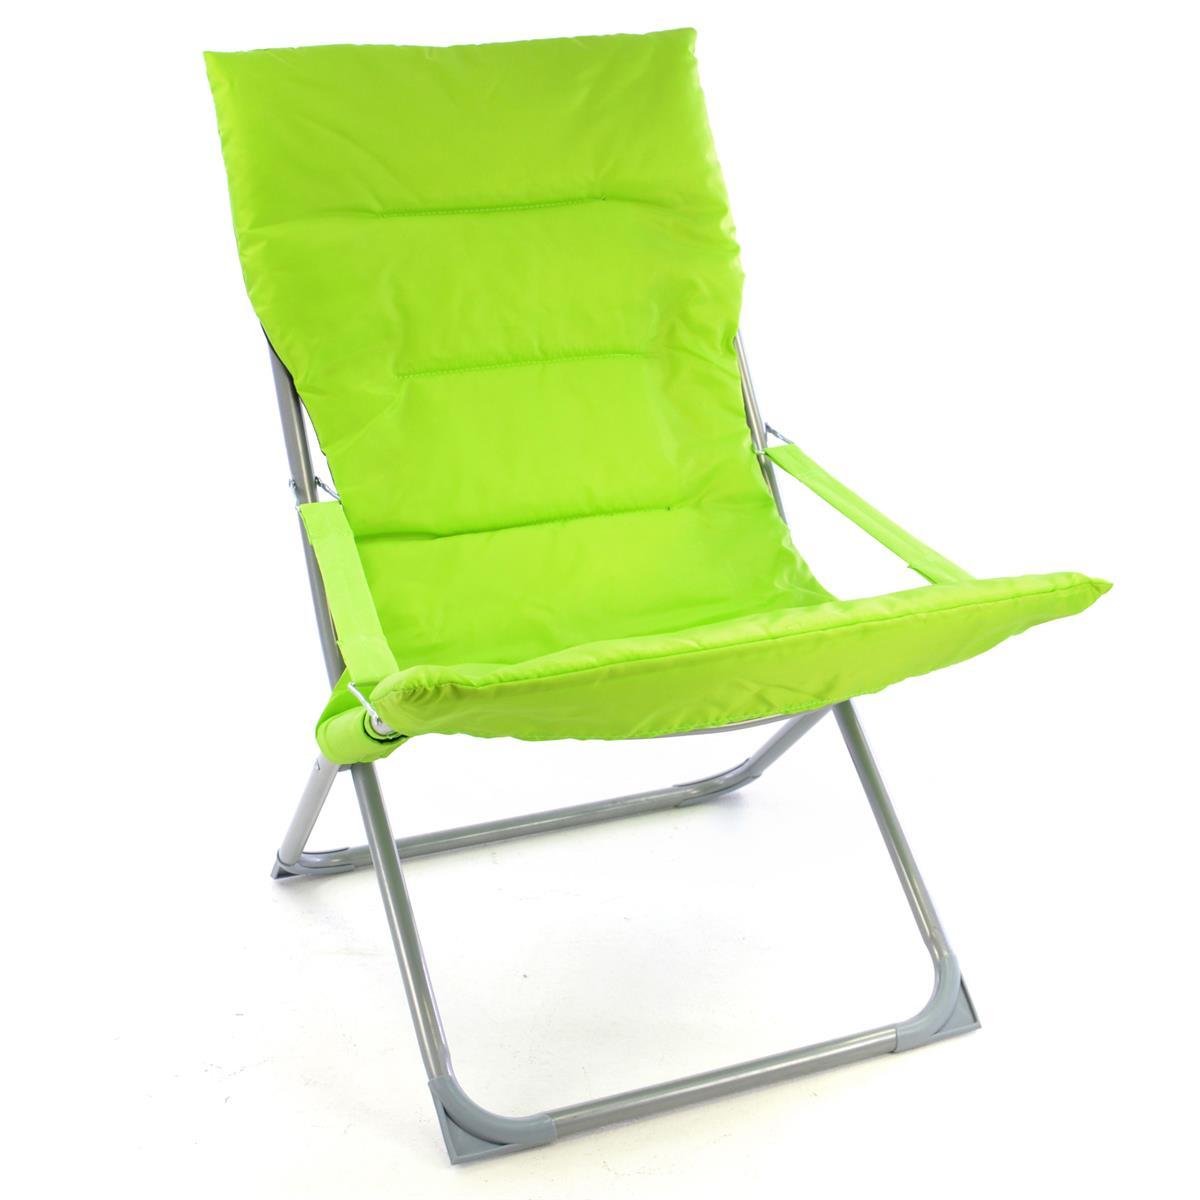 Camping Stuhl Apfelgrün klappbar Stahlrohr Gartenstuhl bis 110 kg Sessel